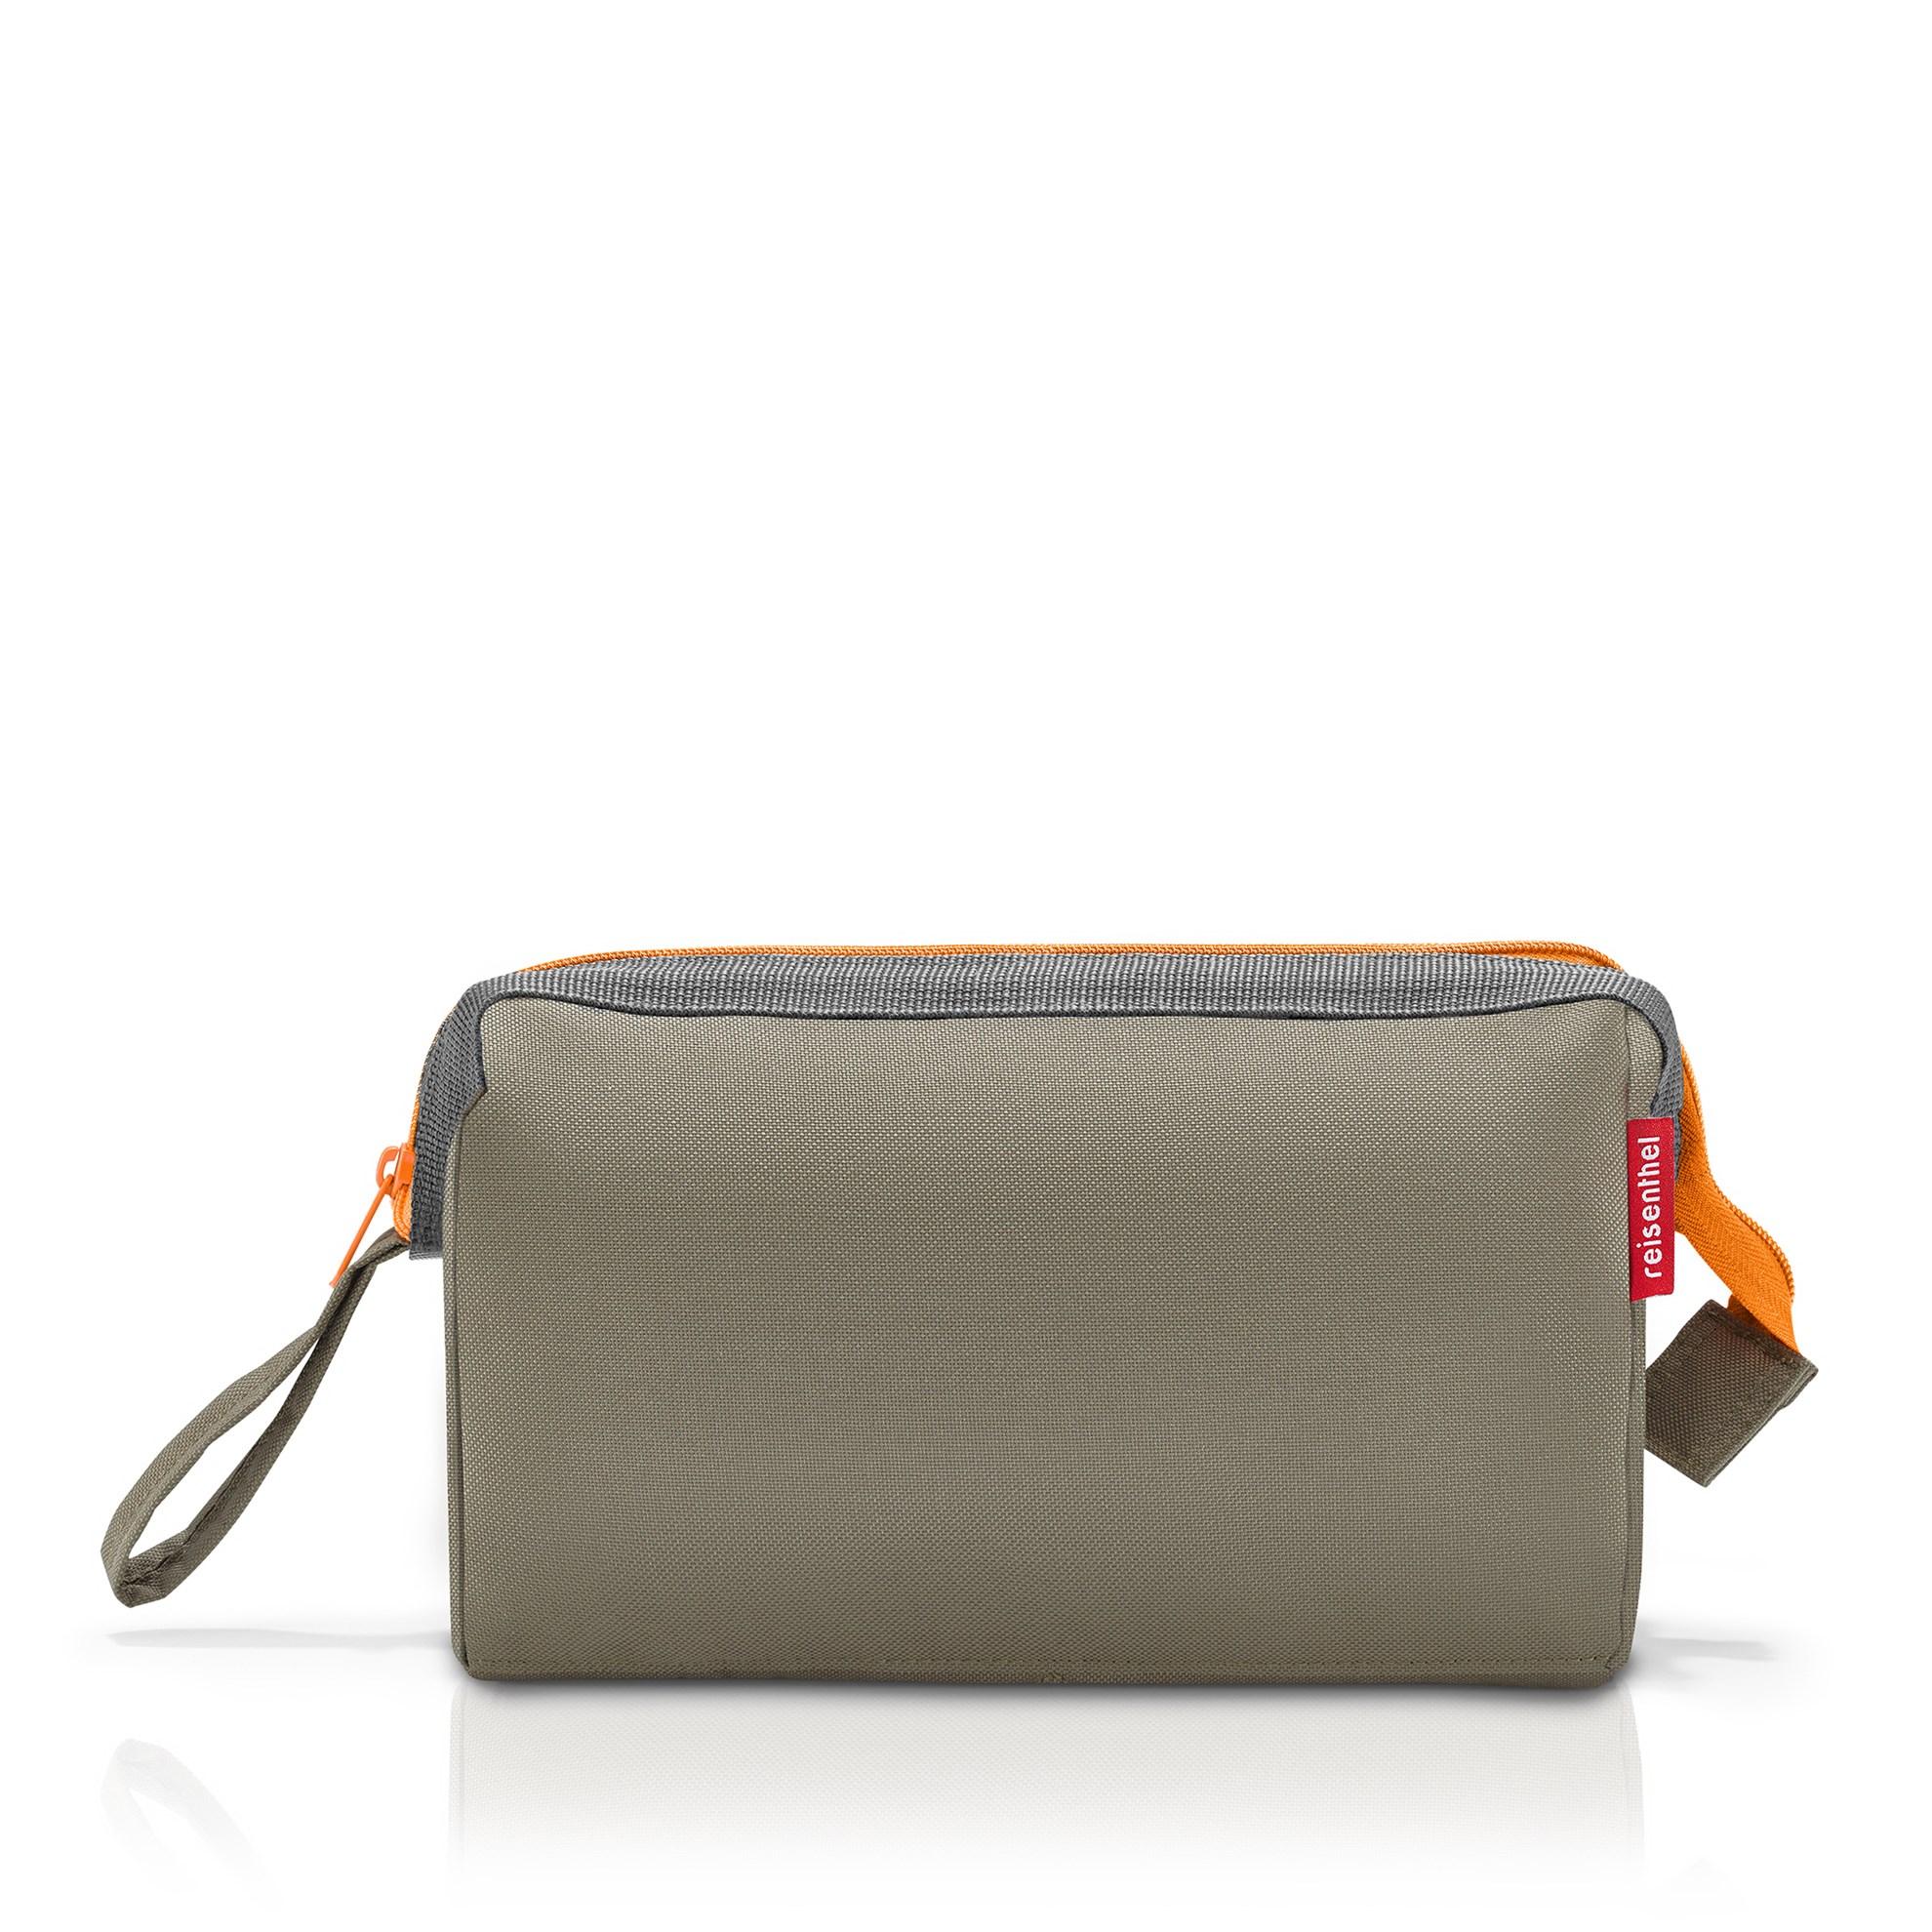 Kosmetická taška Travelcosmetic olive green_1